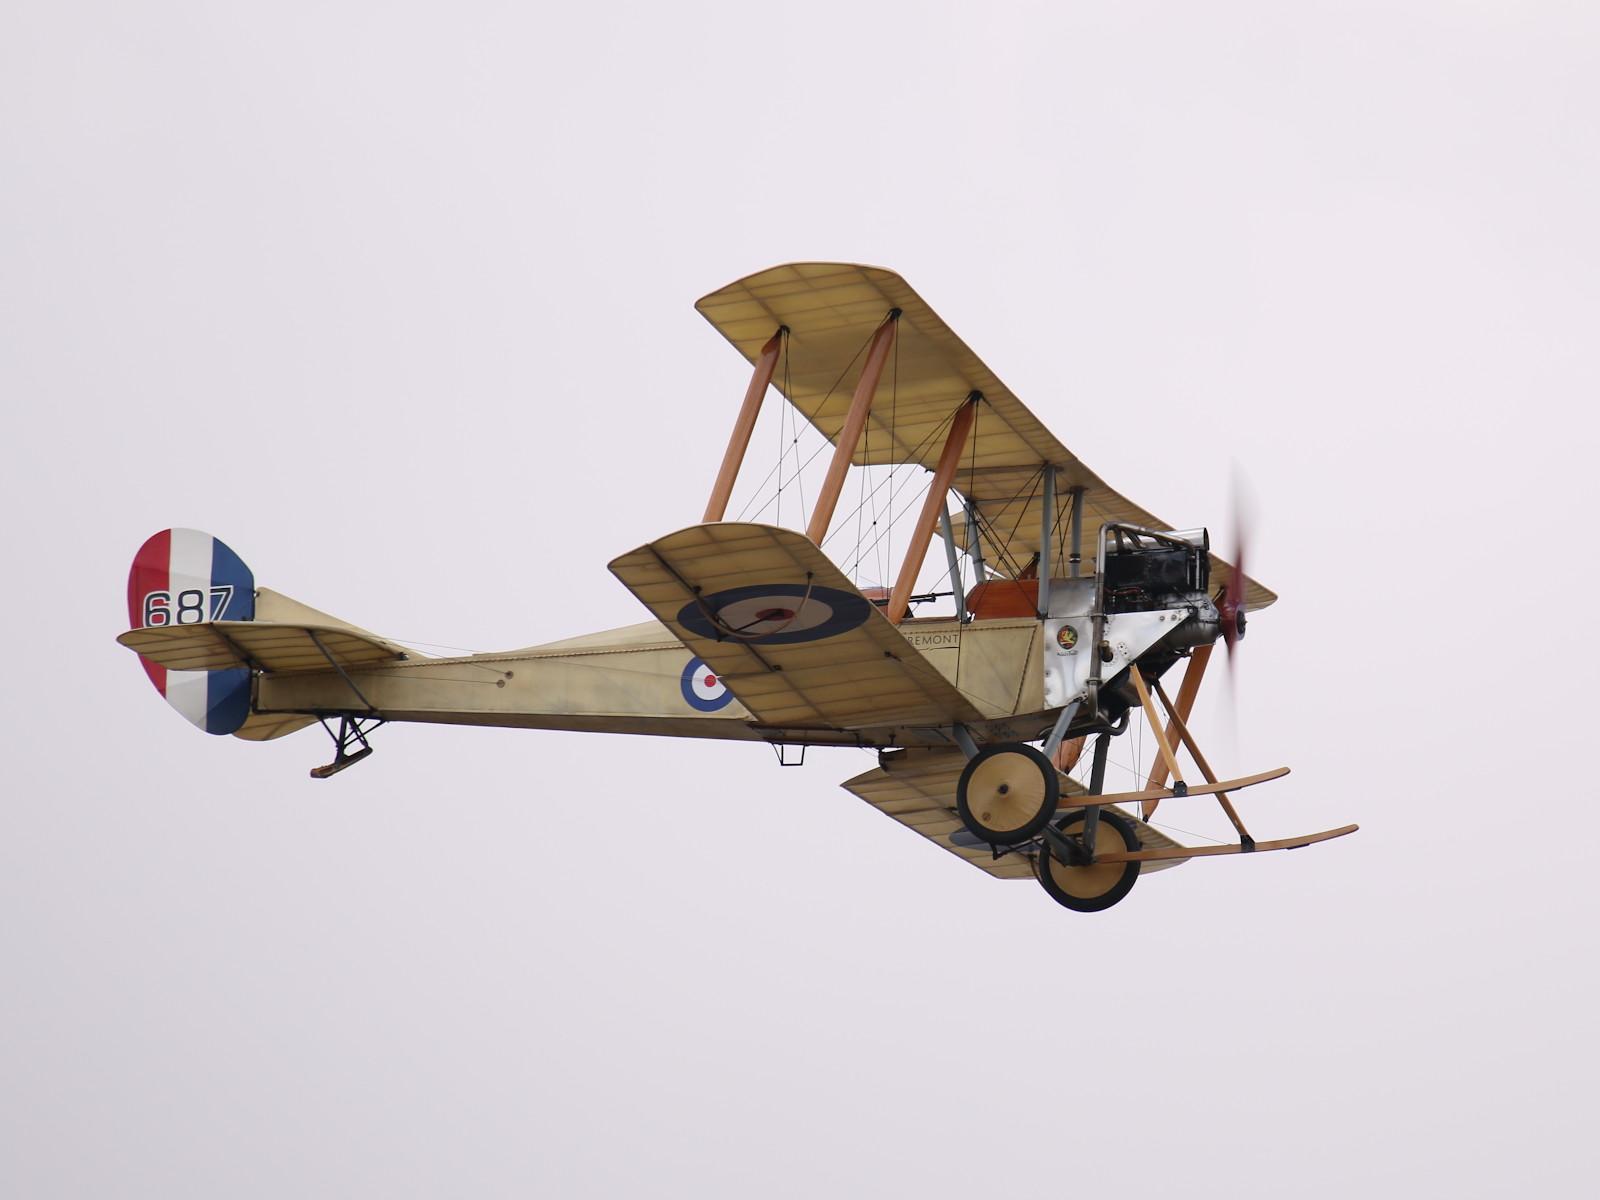 Royal Aircraft Factory BE2c 687 - das erste in GB hergestellte Militärflugzeug © Doppeladler.com